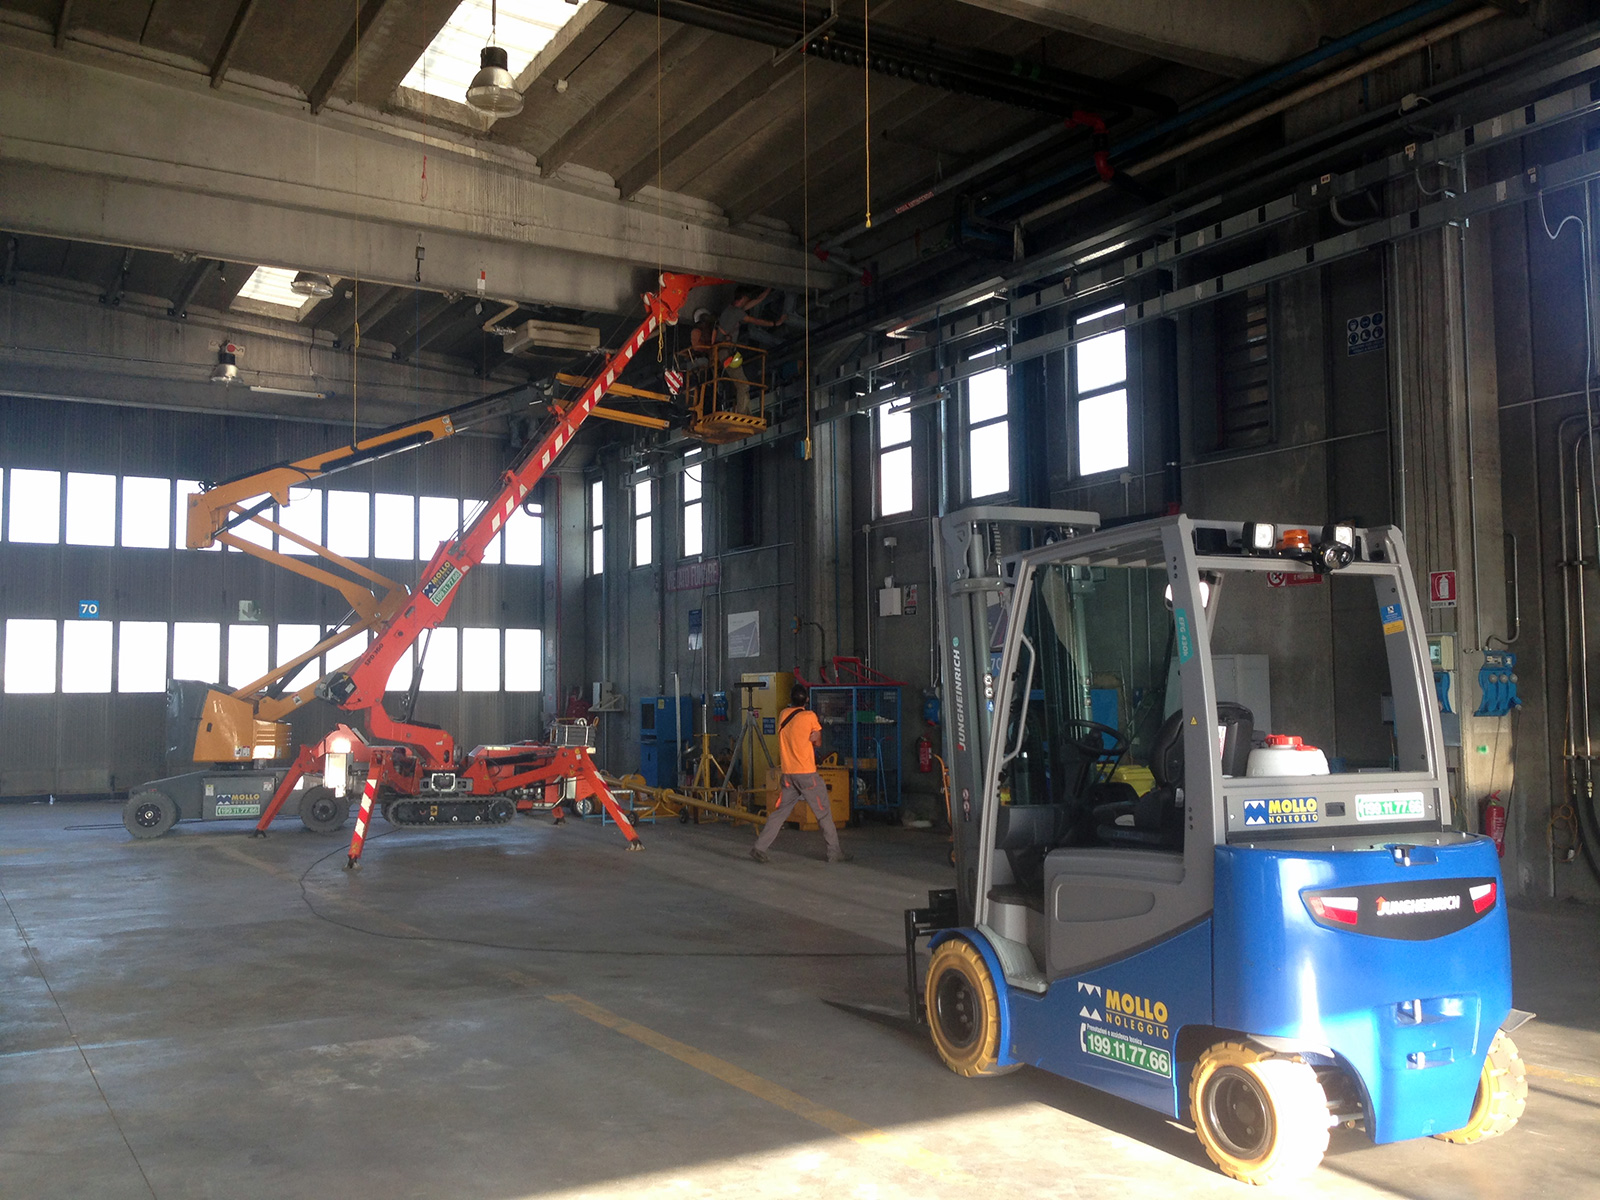 Gruppo ingegneria Torino - Miglioramento sismico fabbricato industriale